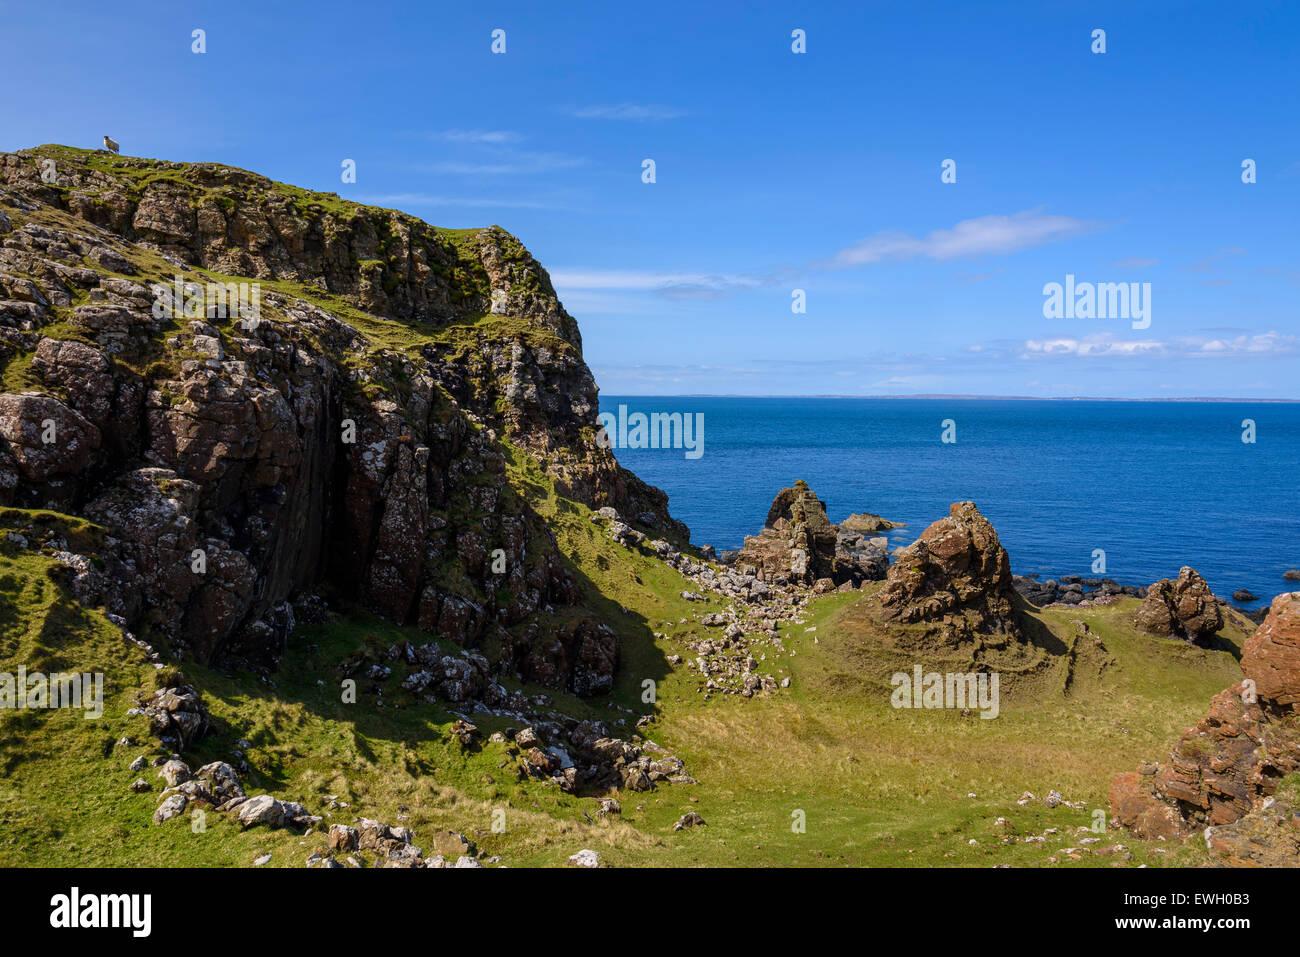 Cliffs around Treshnish Point, Isle of Mull, Hebrides, Argyll and Bute, Scotland - Stock Image